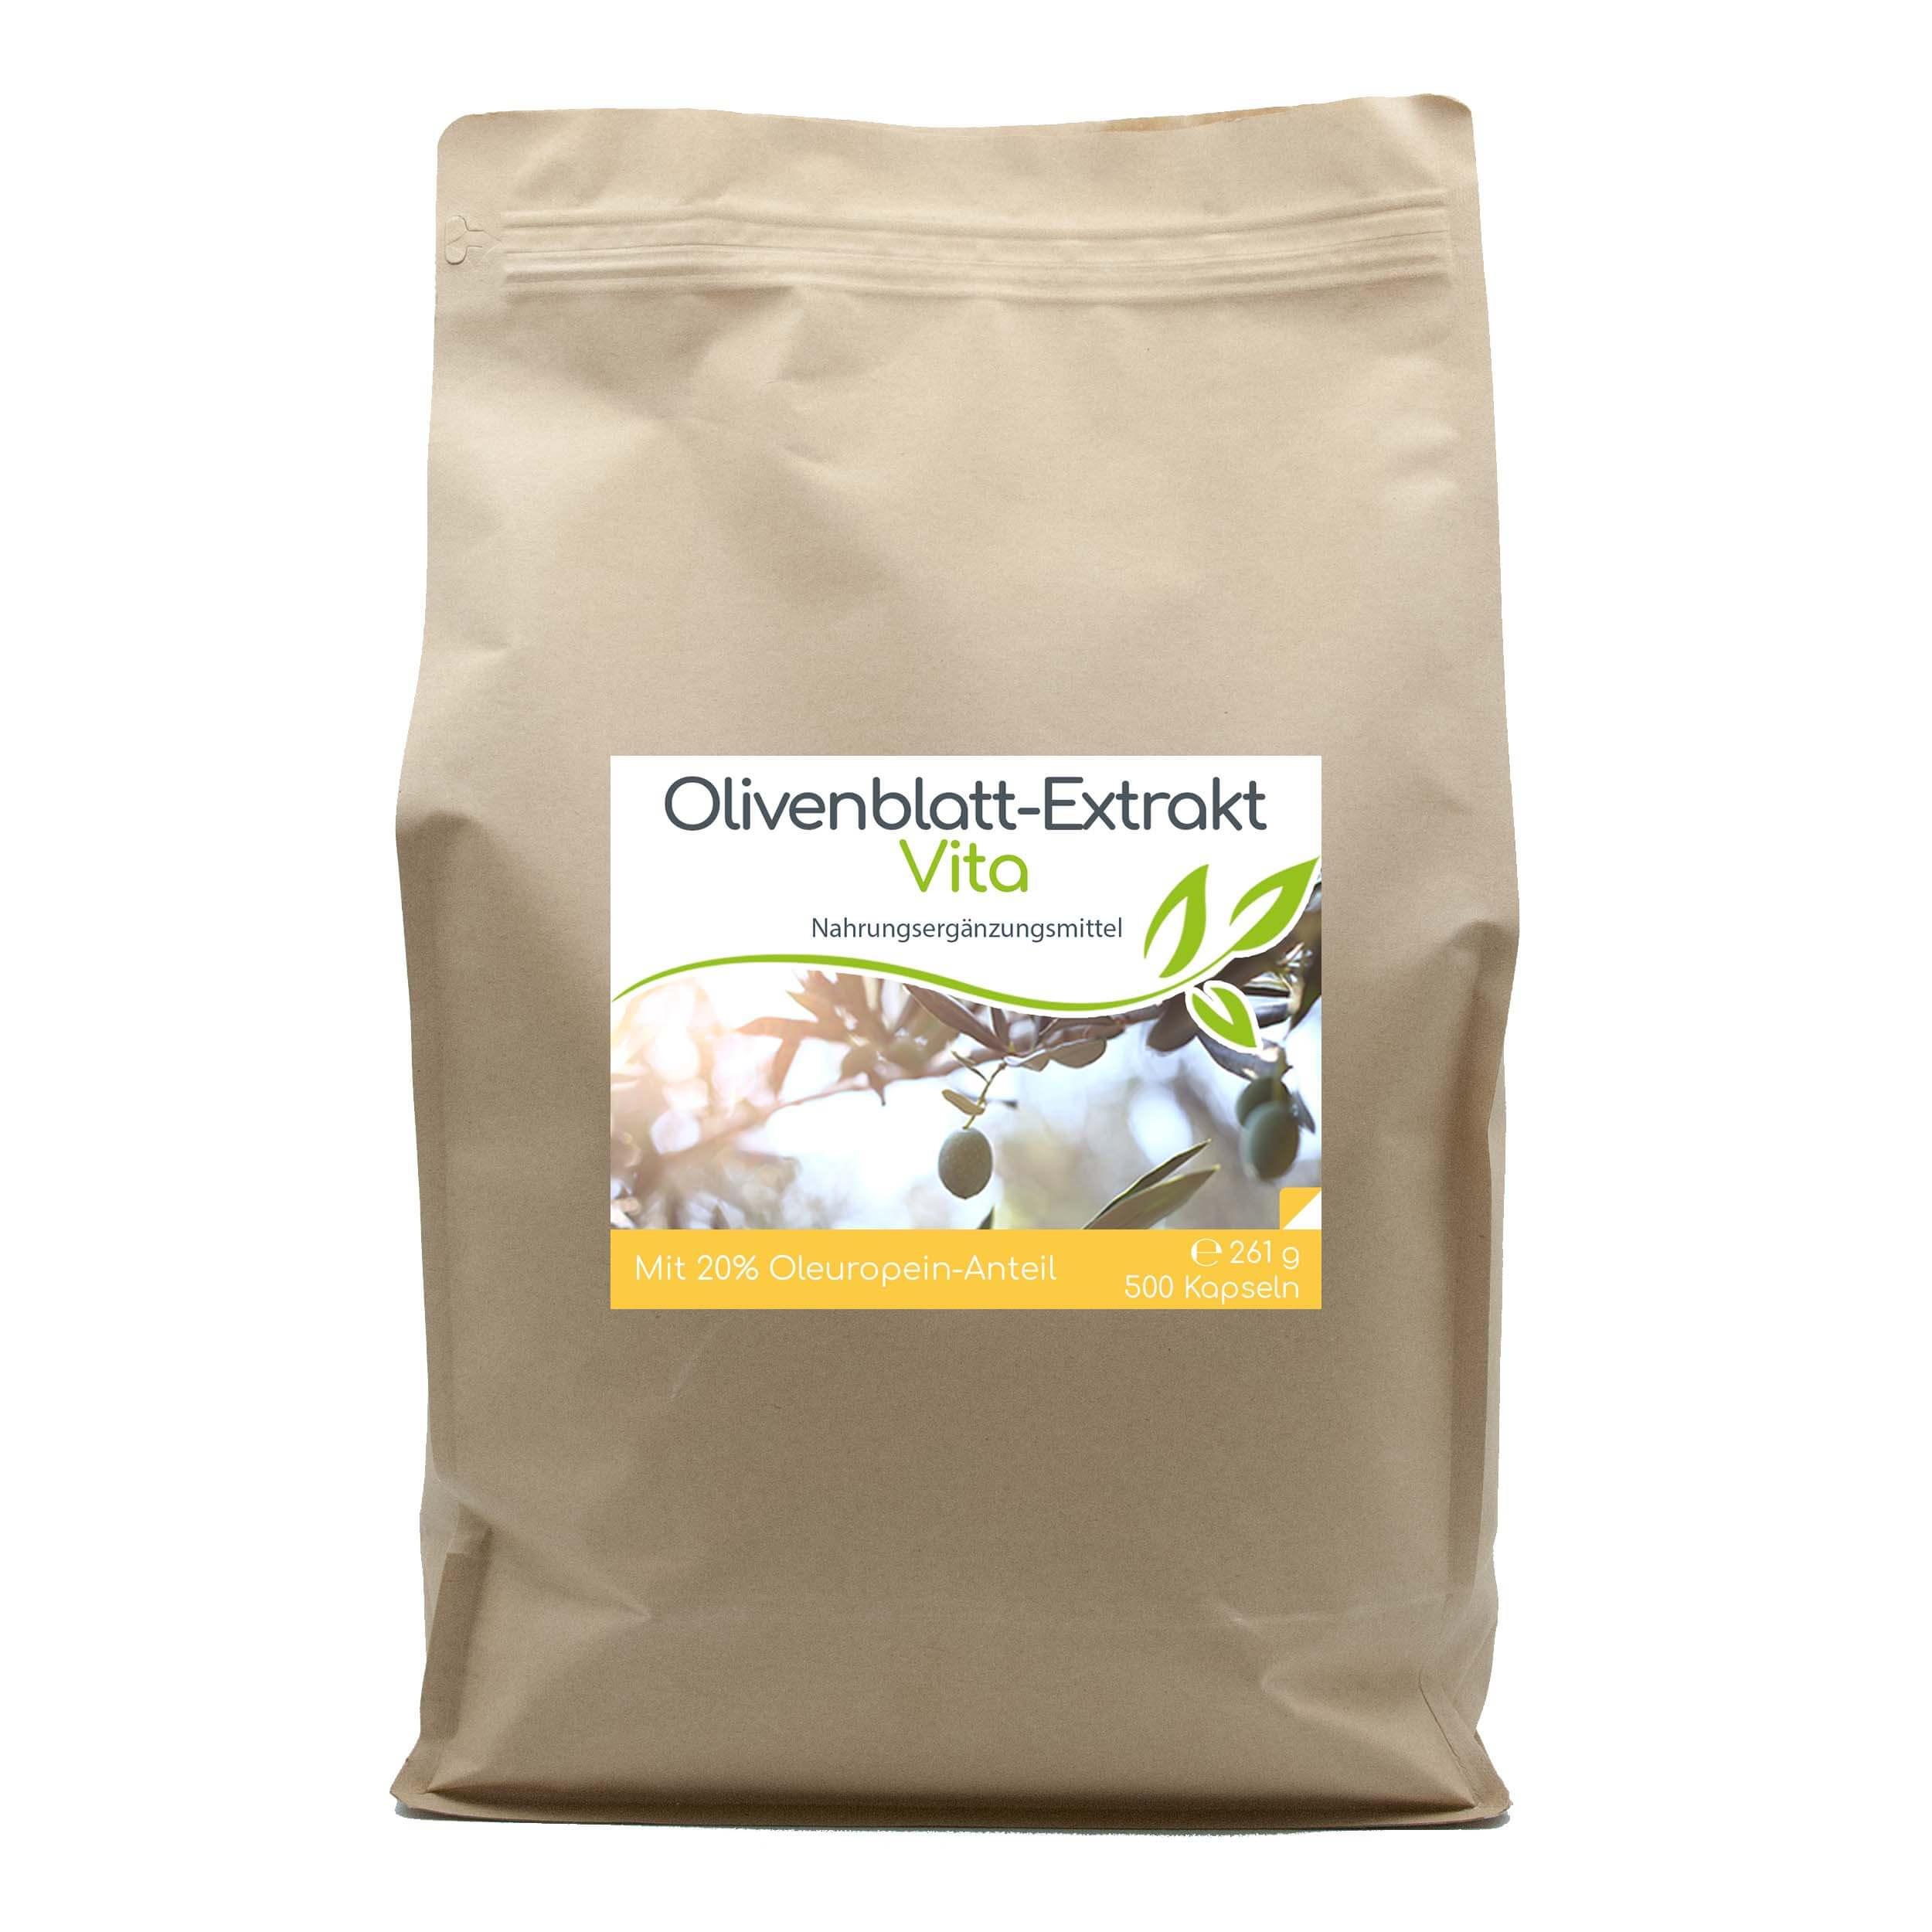 Olivenblatt-Extrakt Vita mit 20% Oleuropein-Anteil | 500 Kapseln Vorratsbeutel